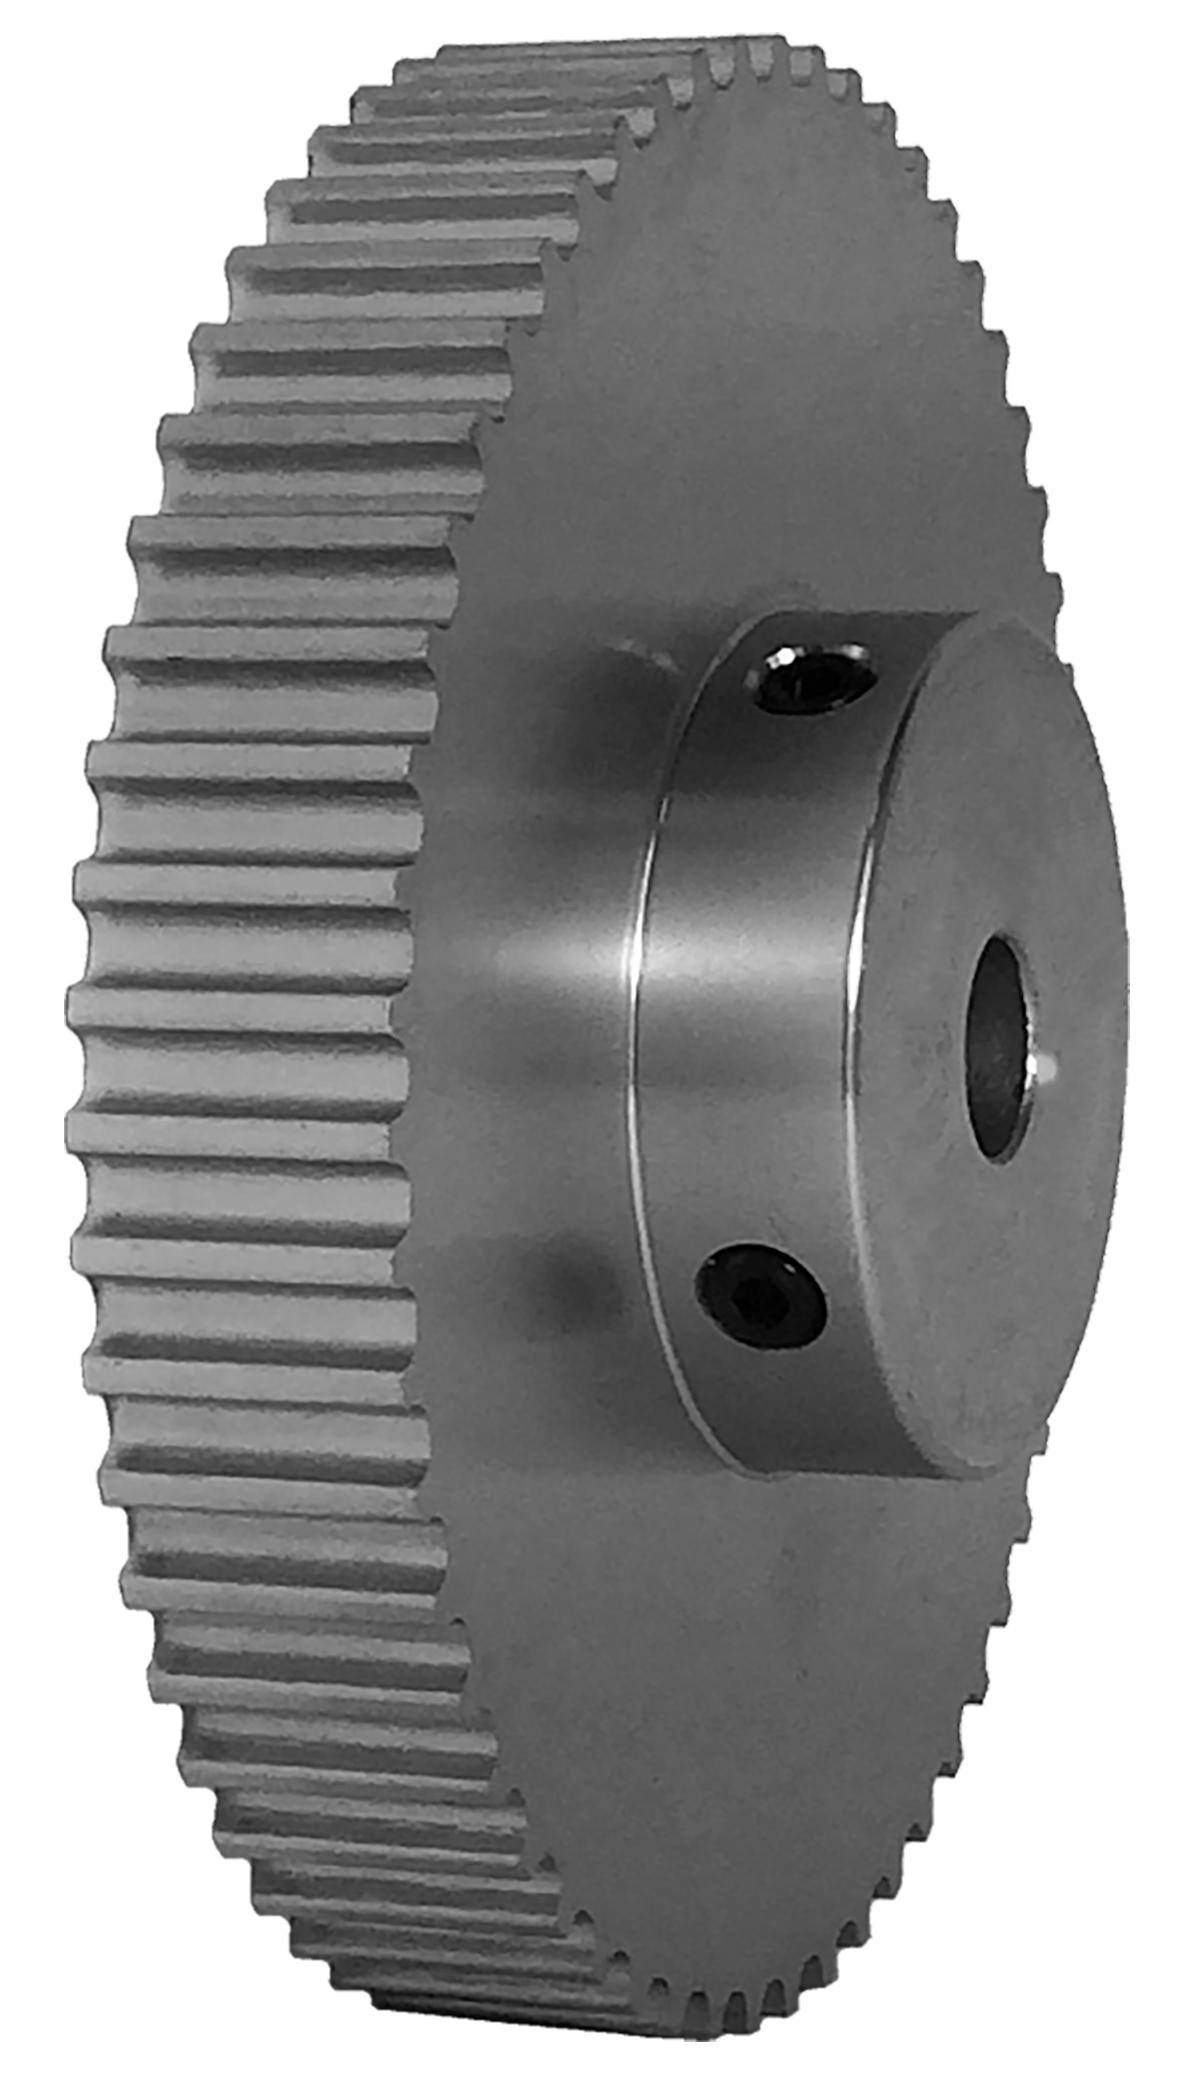 56-5M09-6A5 - Aluminum Powerhouse®HTD® Pulleys